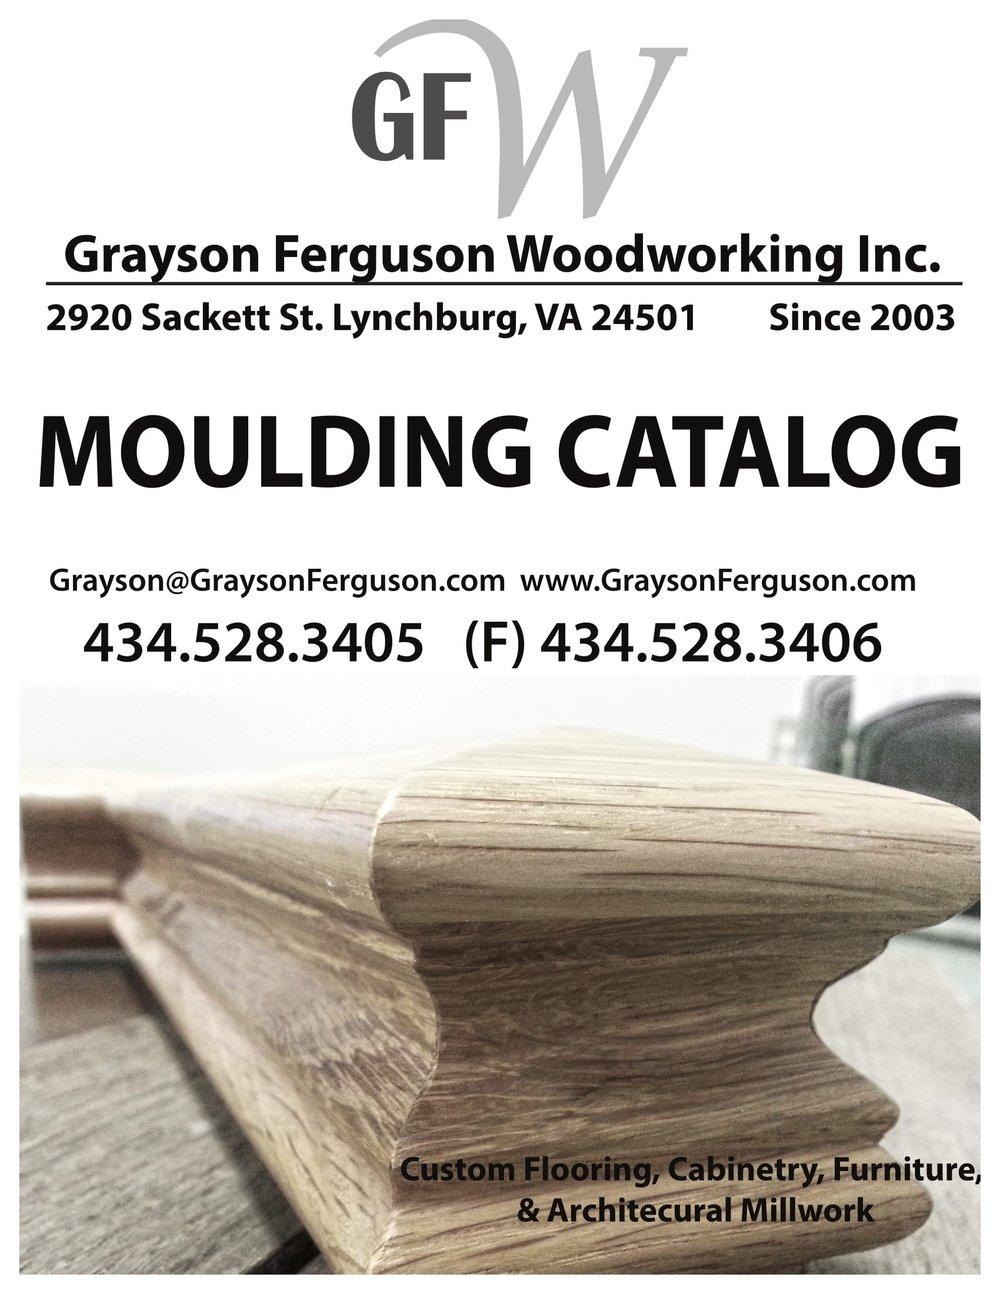 Moulding Catalog — Grayson Ferguson Woodworking